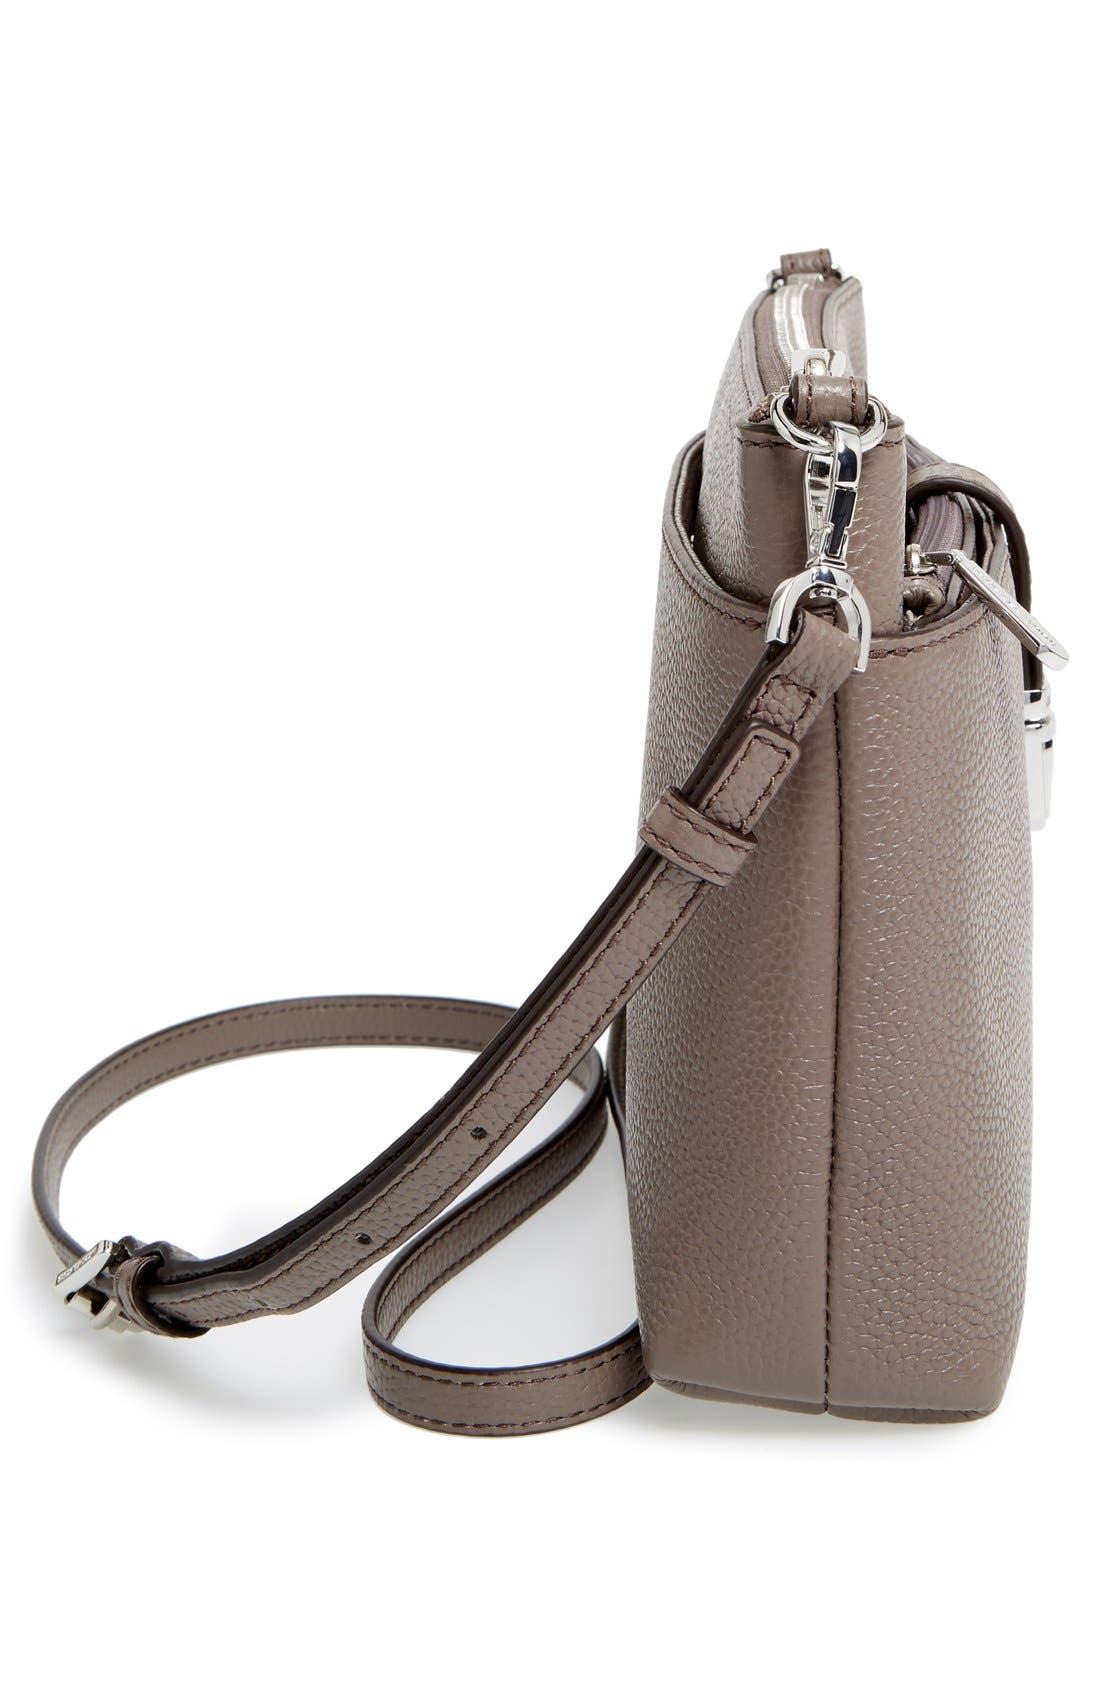 Large Mercer Leather Crossbody Bag,                             Alternate thumbnail 3, color,                             513